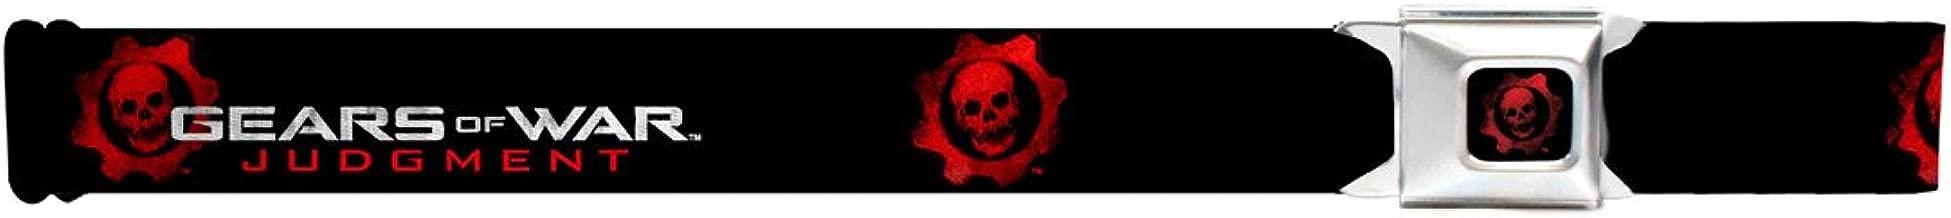 Gears of War Judgment Crimson Omen Logo Seatbelt Mesh Belt